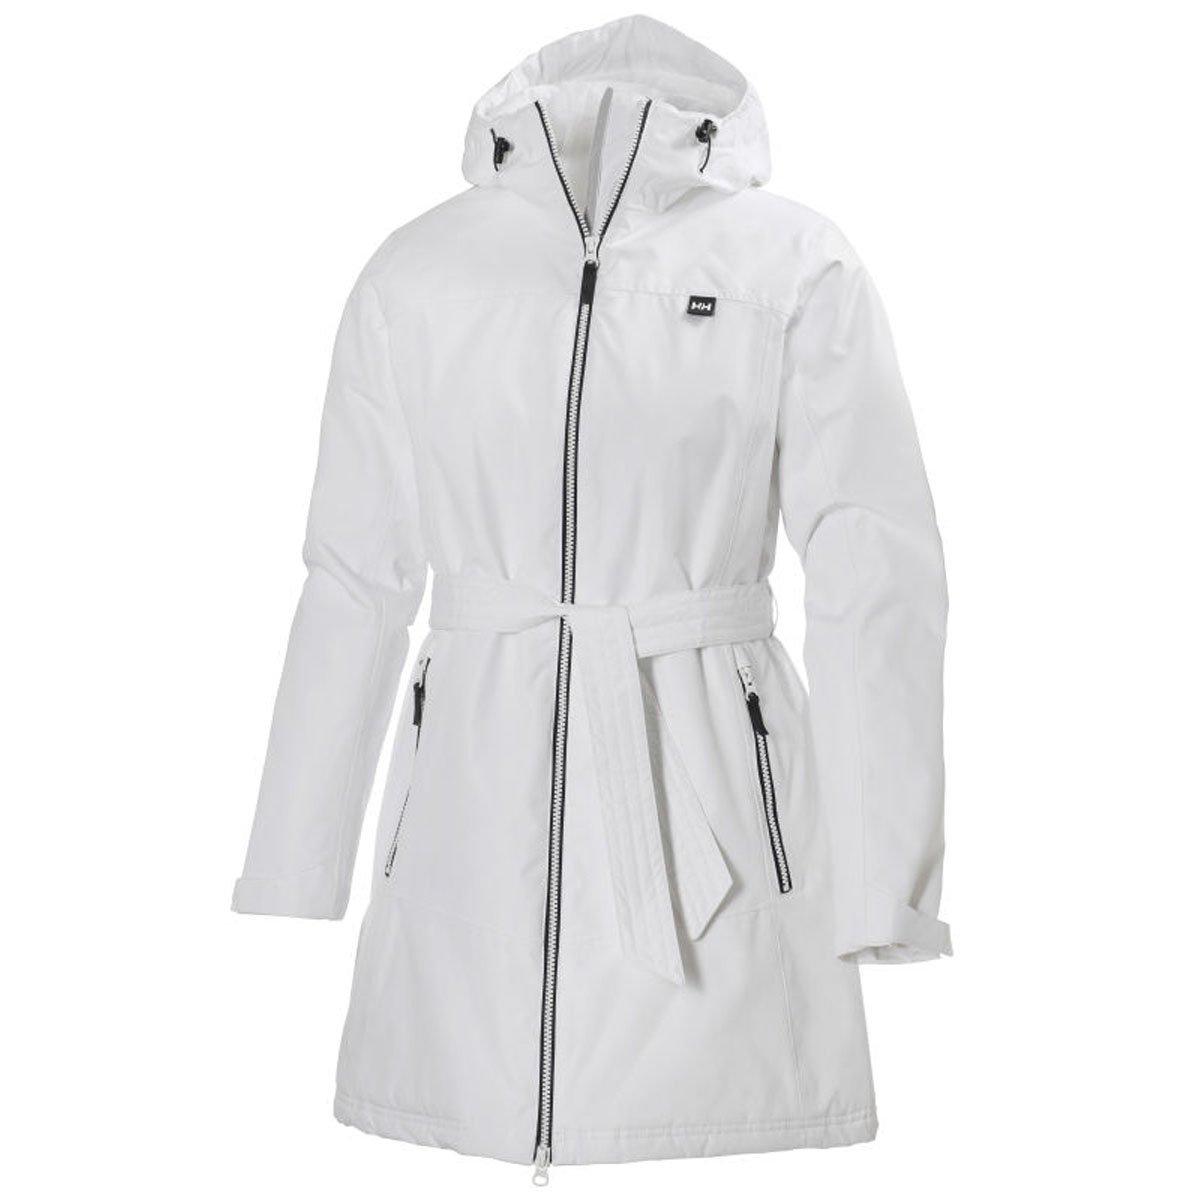 Amazon.com: Helly Hansen Women's Long Bykkle Insulated Rain Jacket ...